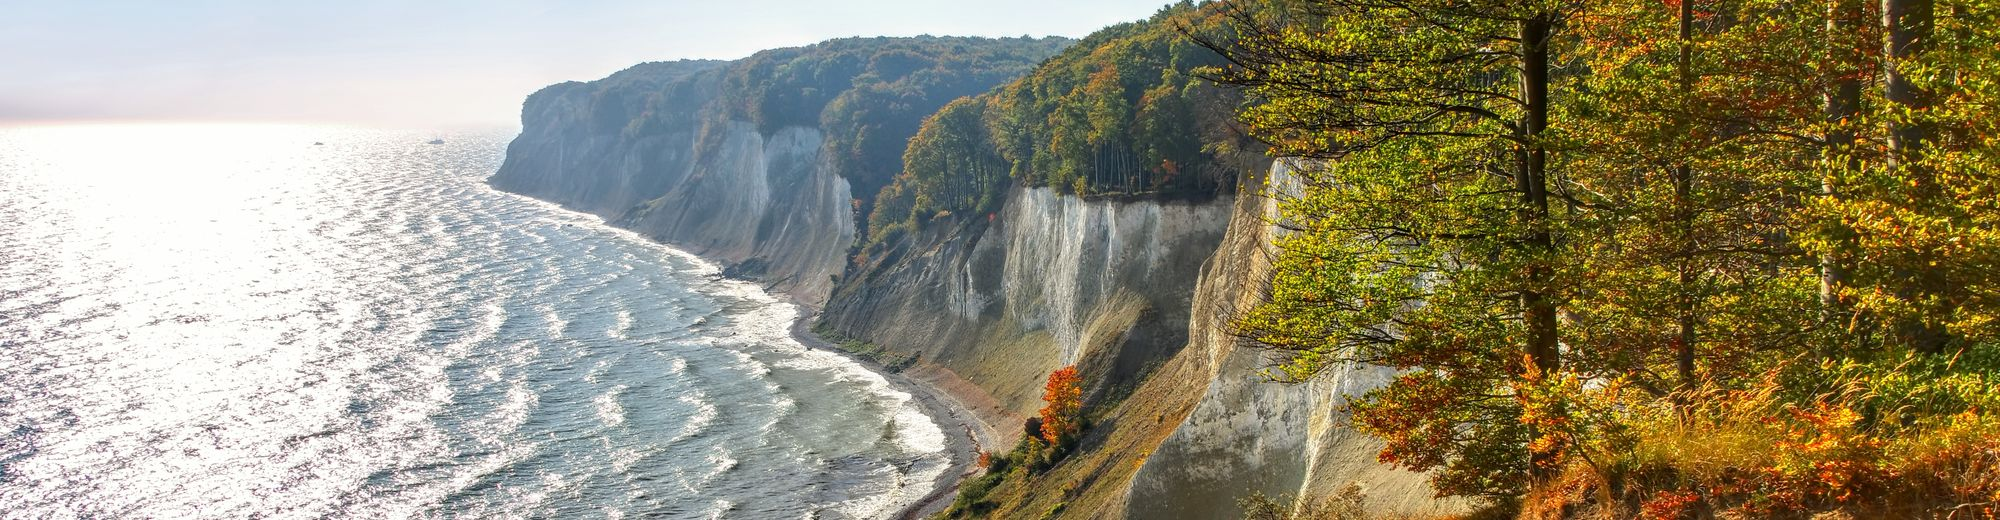 Rügen Kreideküste im Herbst - Ruegen chalk cliffs in autumn | © LianeM/stock.adobe.com